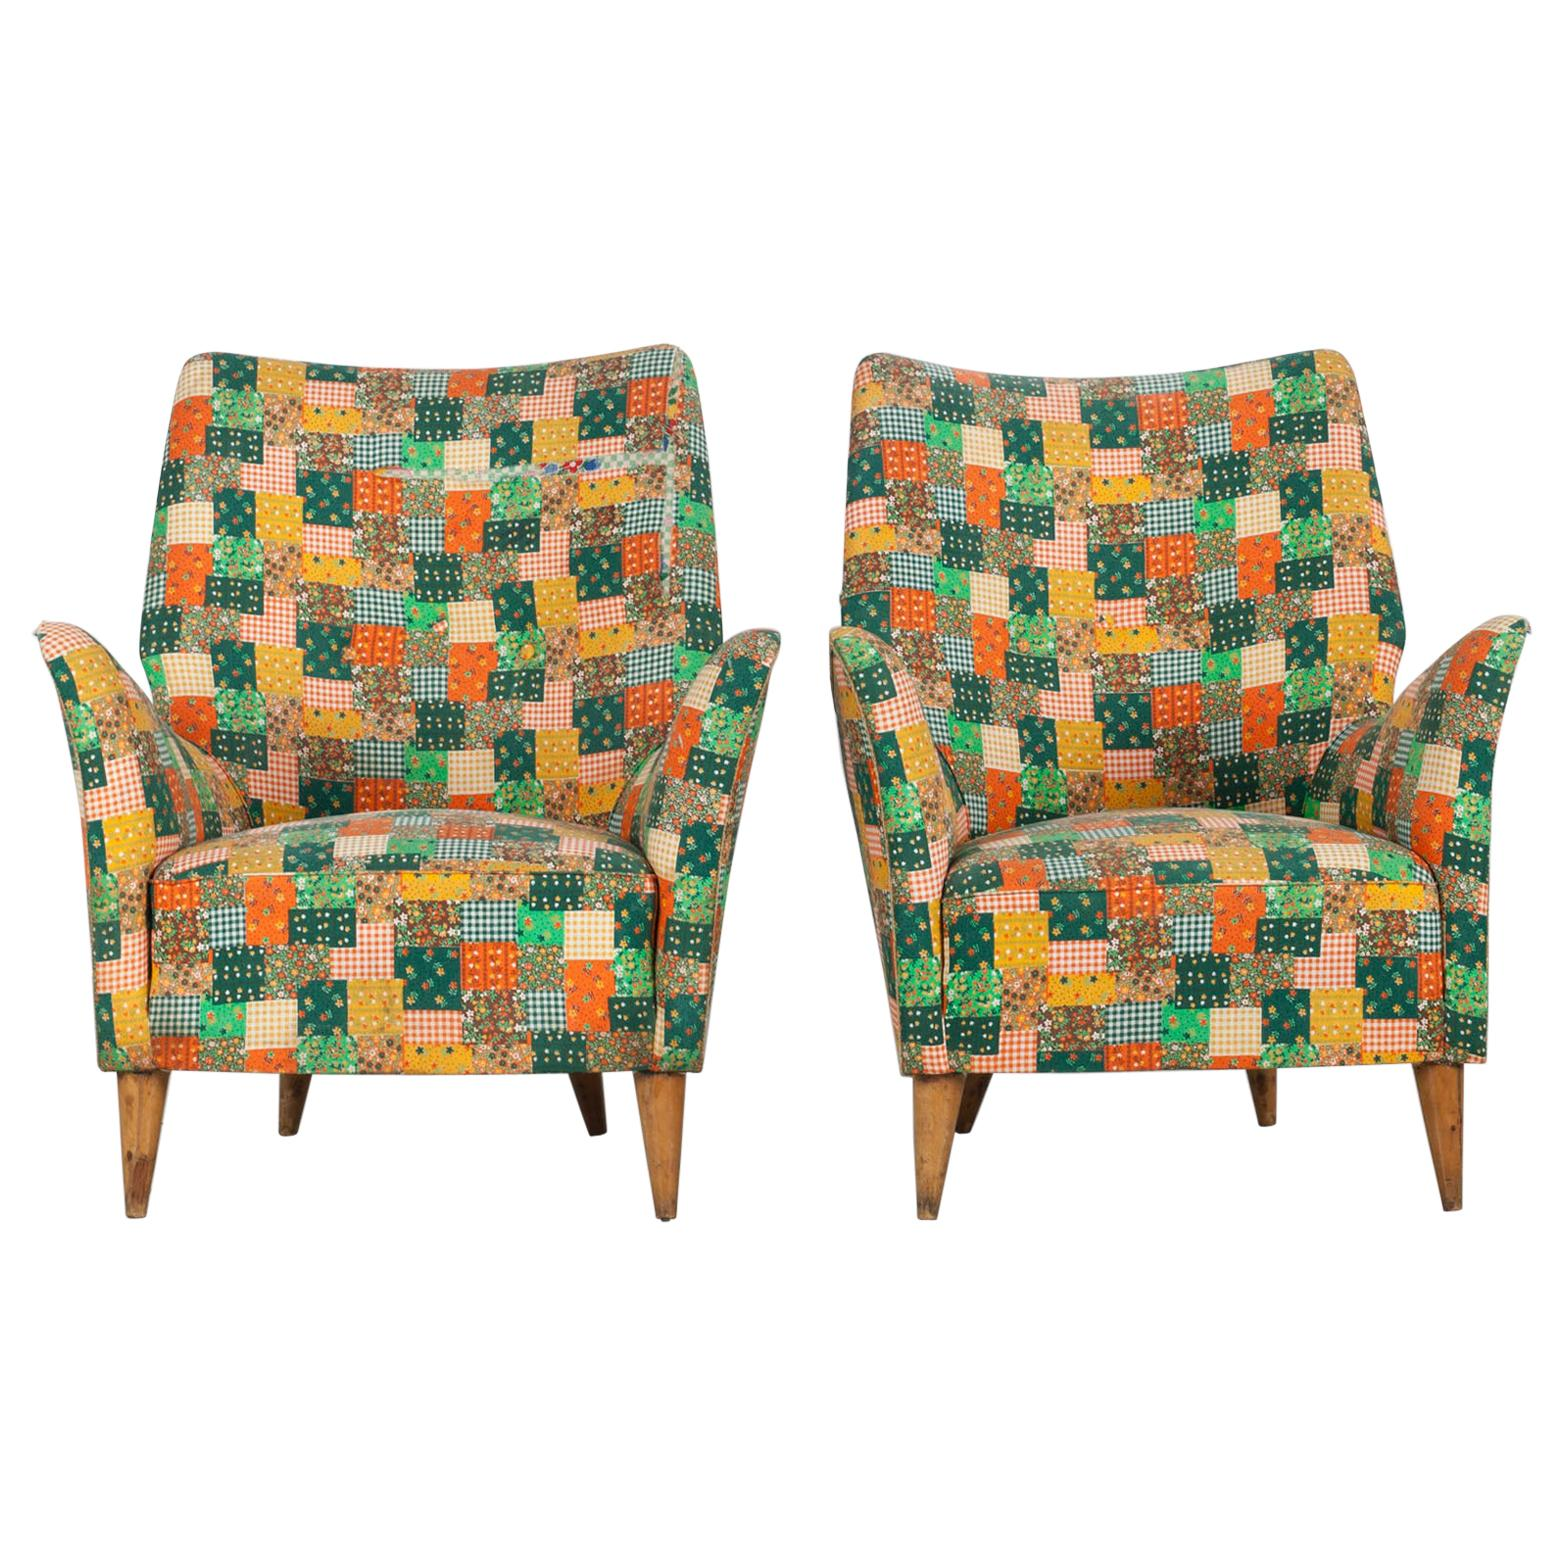 Set of 2 Chairs, I.S.A. Bergamo, 1950s